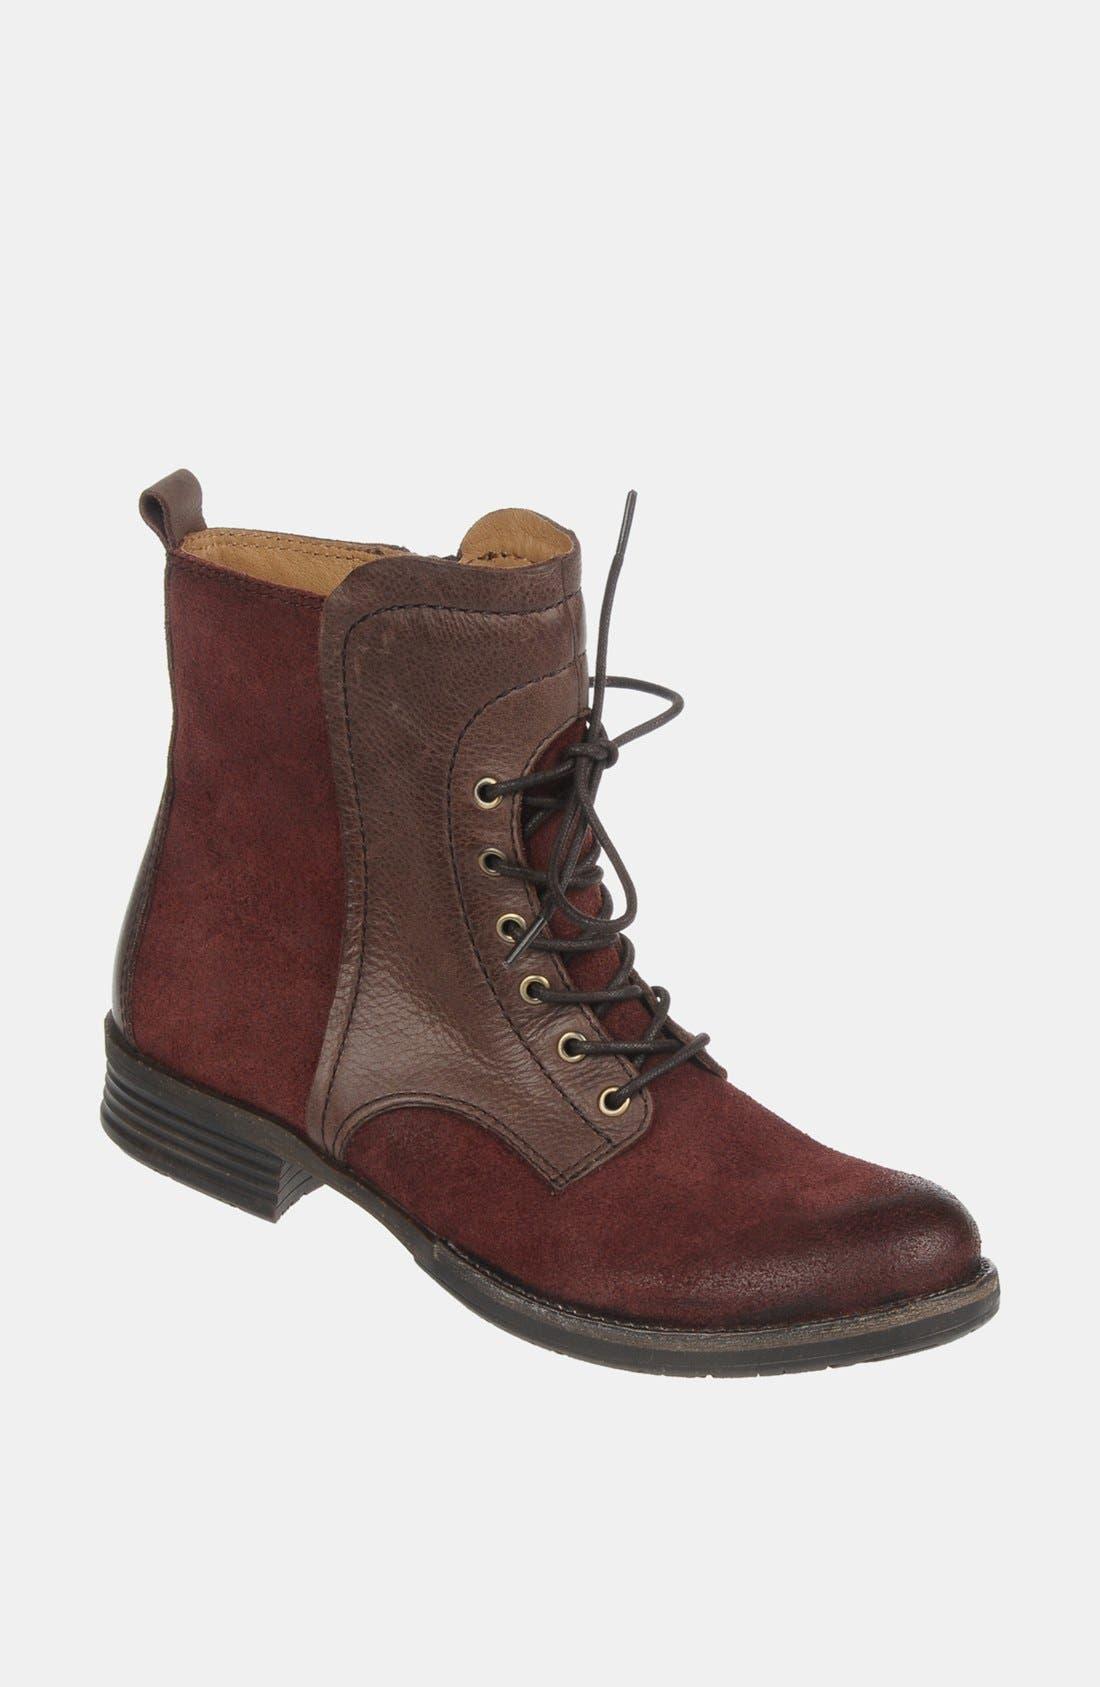 Alternate Image 1 Selected - Naya 'Agave' Boot